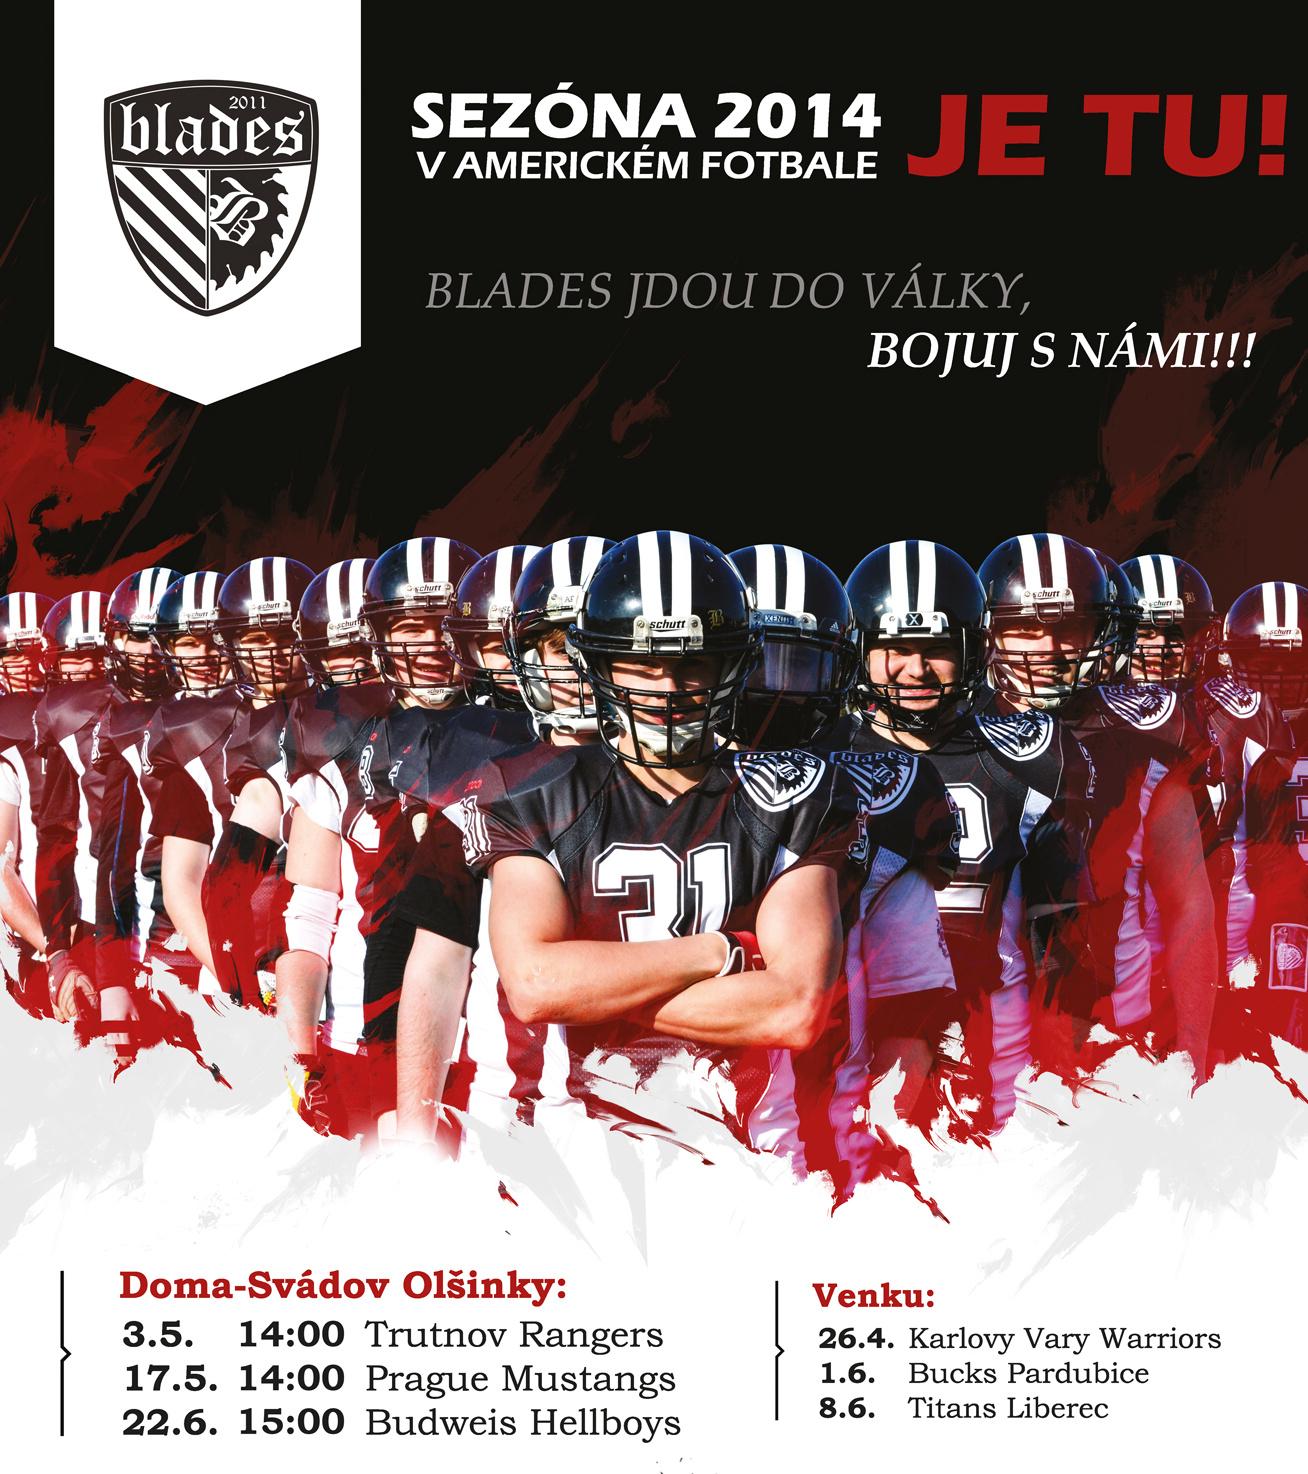 Sezona 2014 v americkém fotbale klub Blades Svádov